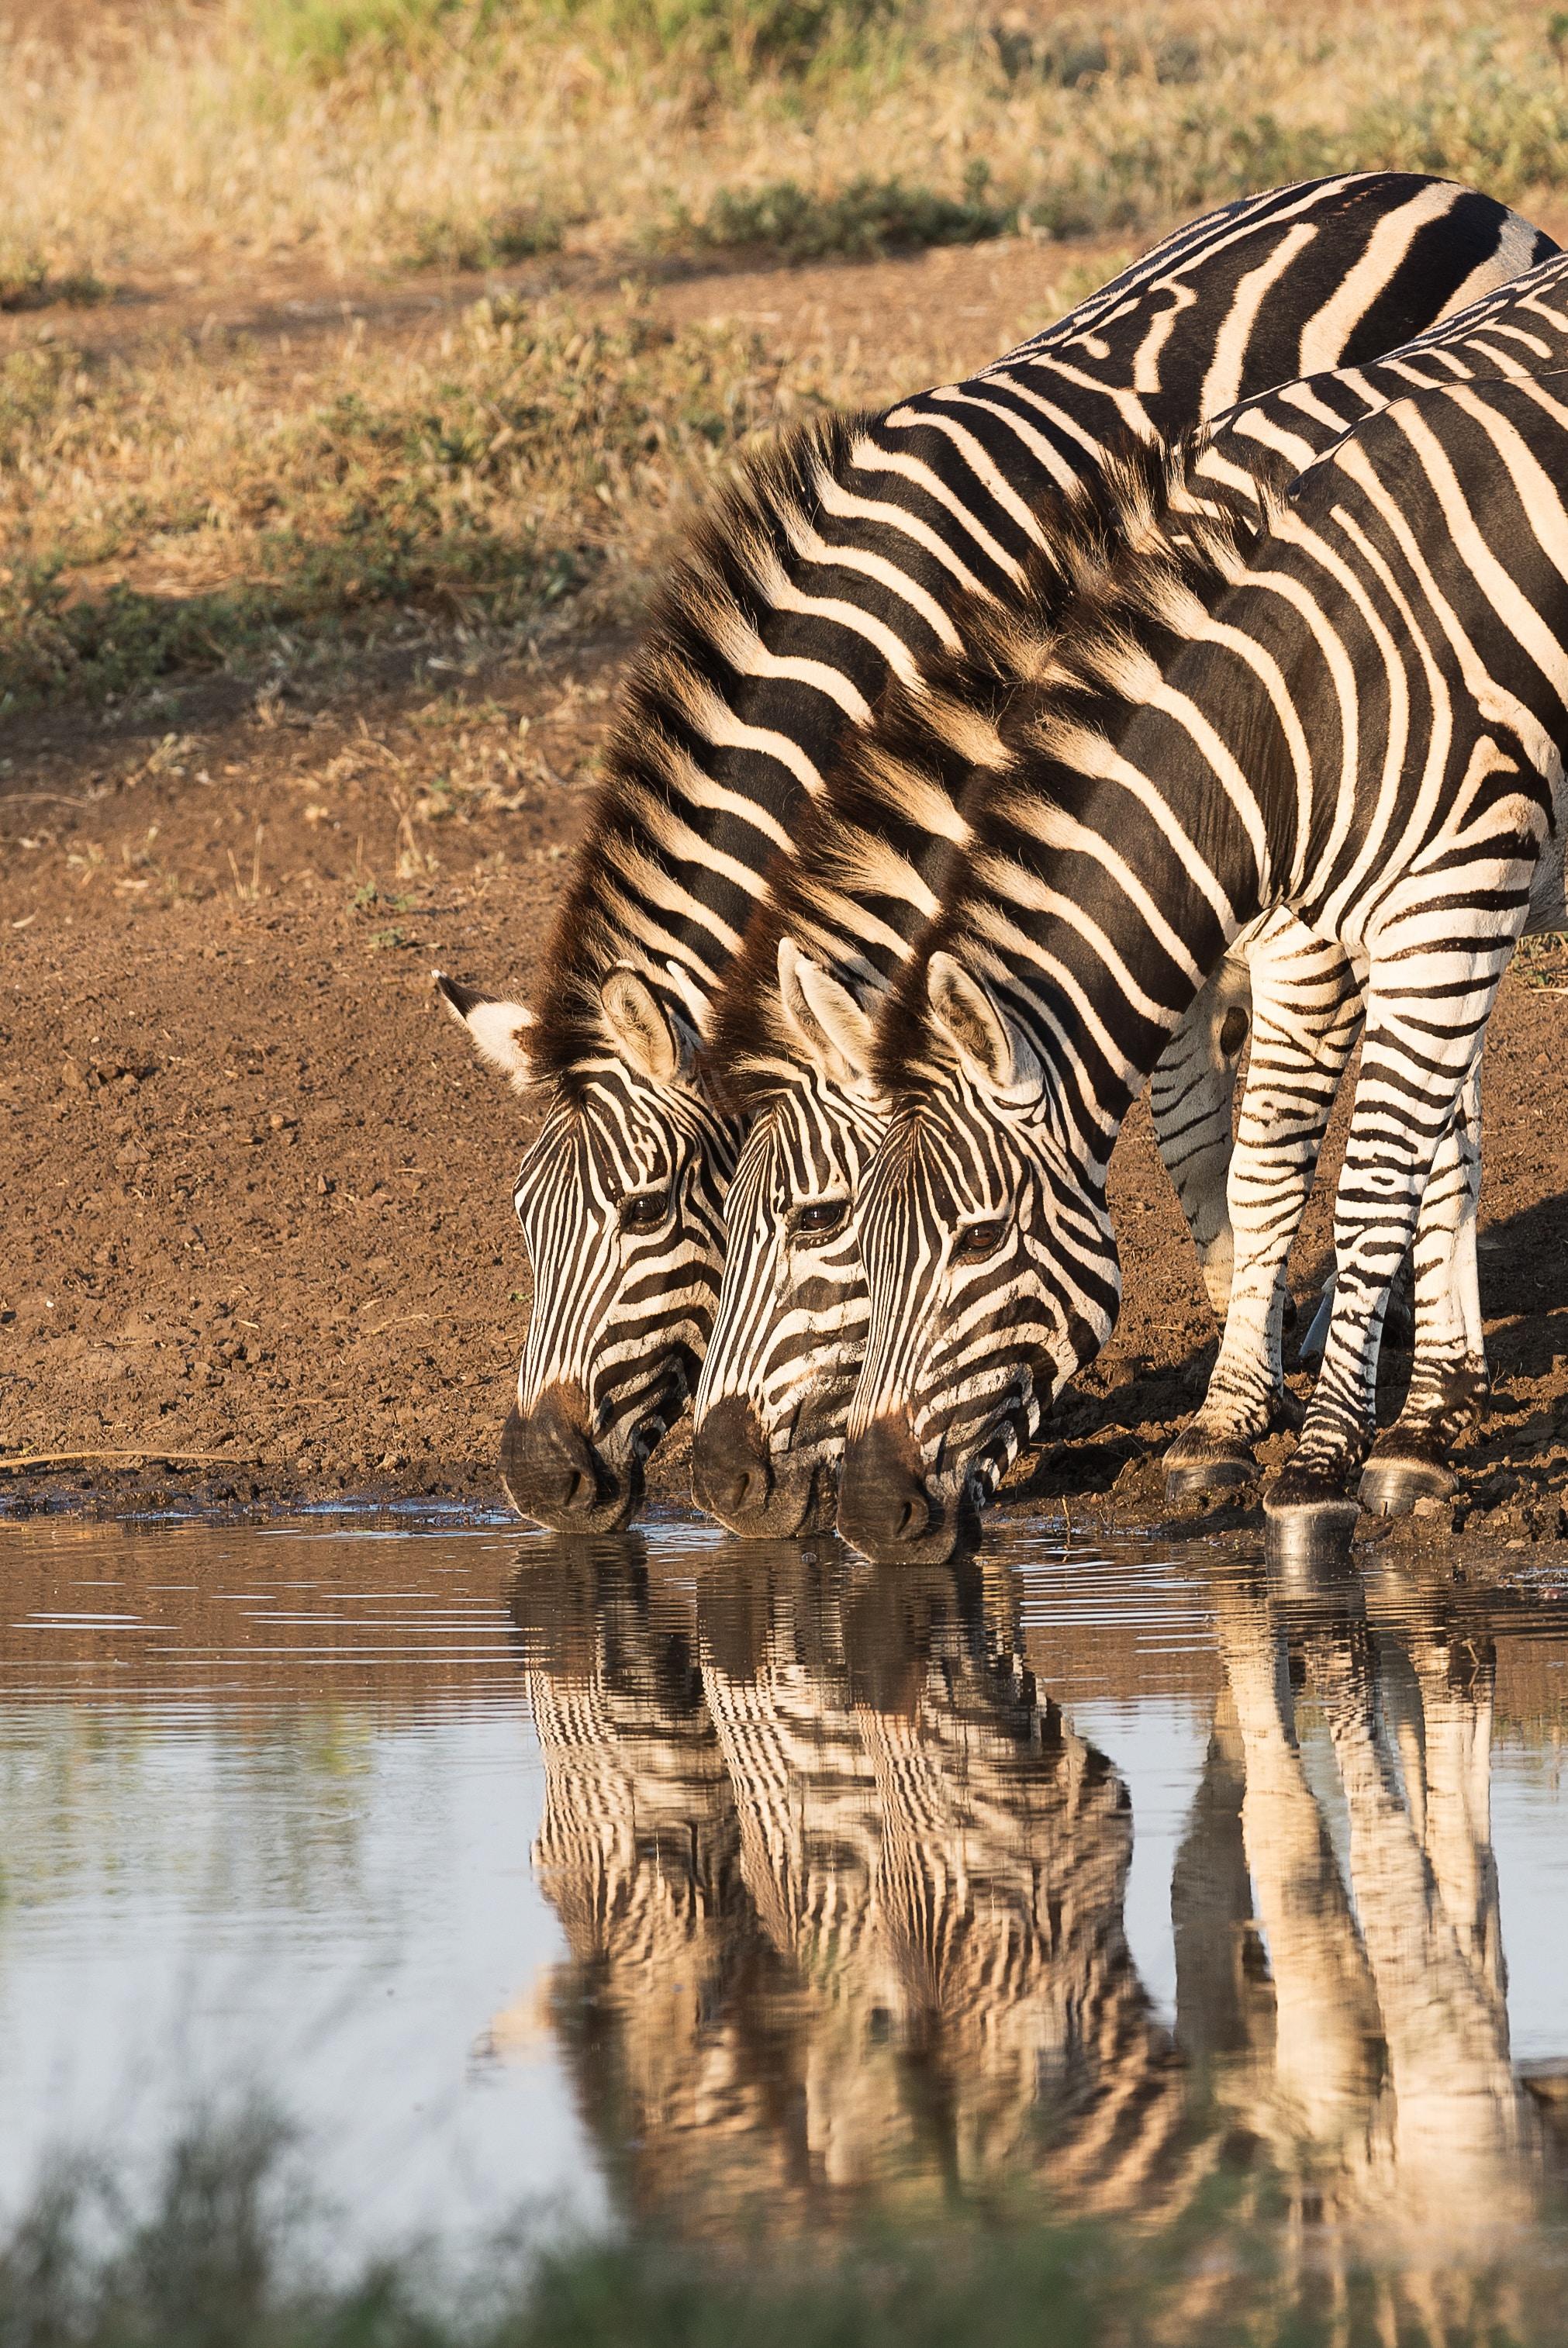 three zebra drinking water from body of water